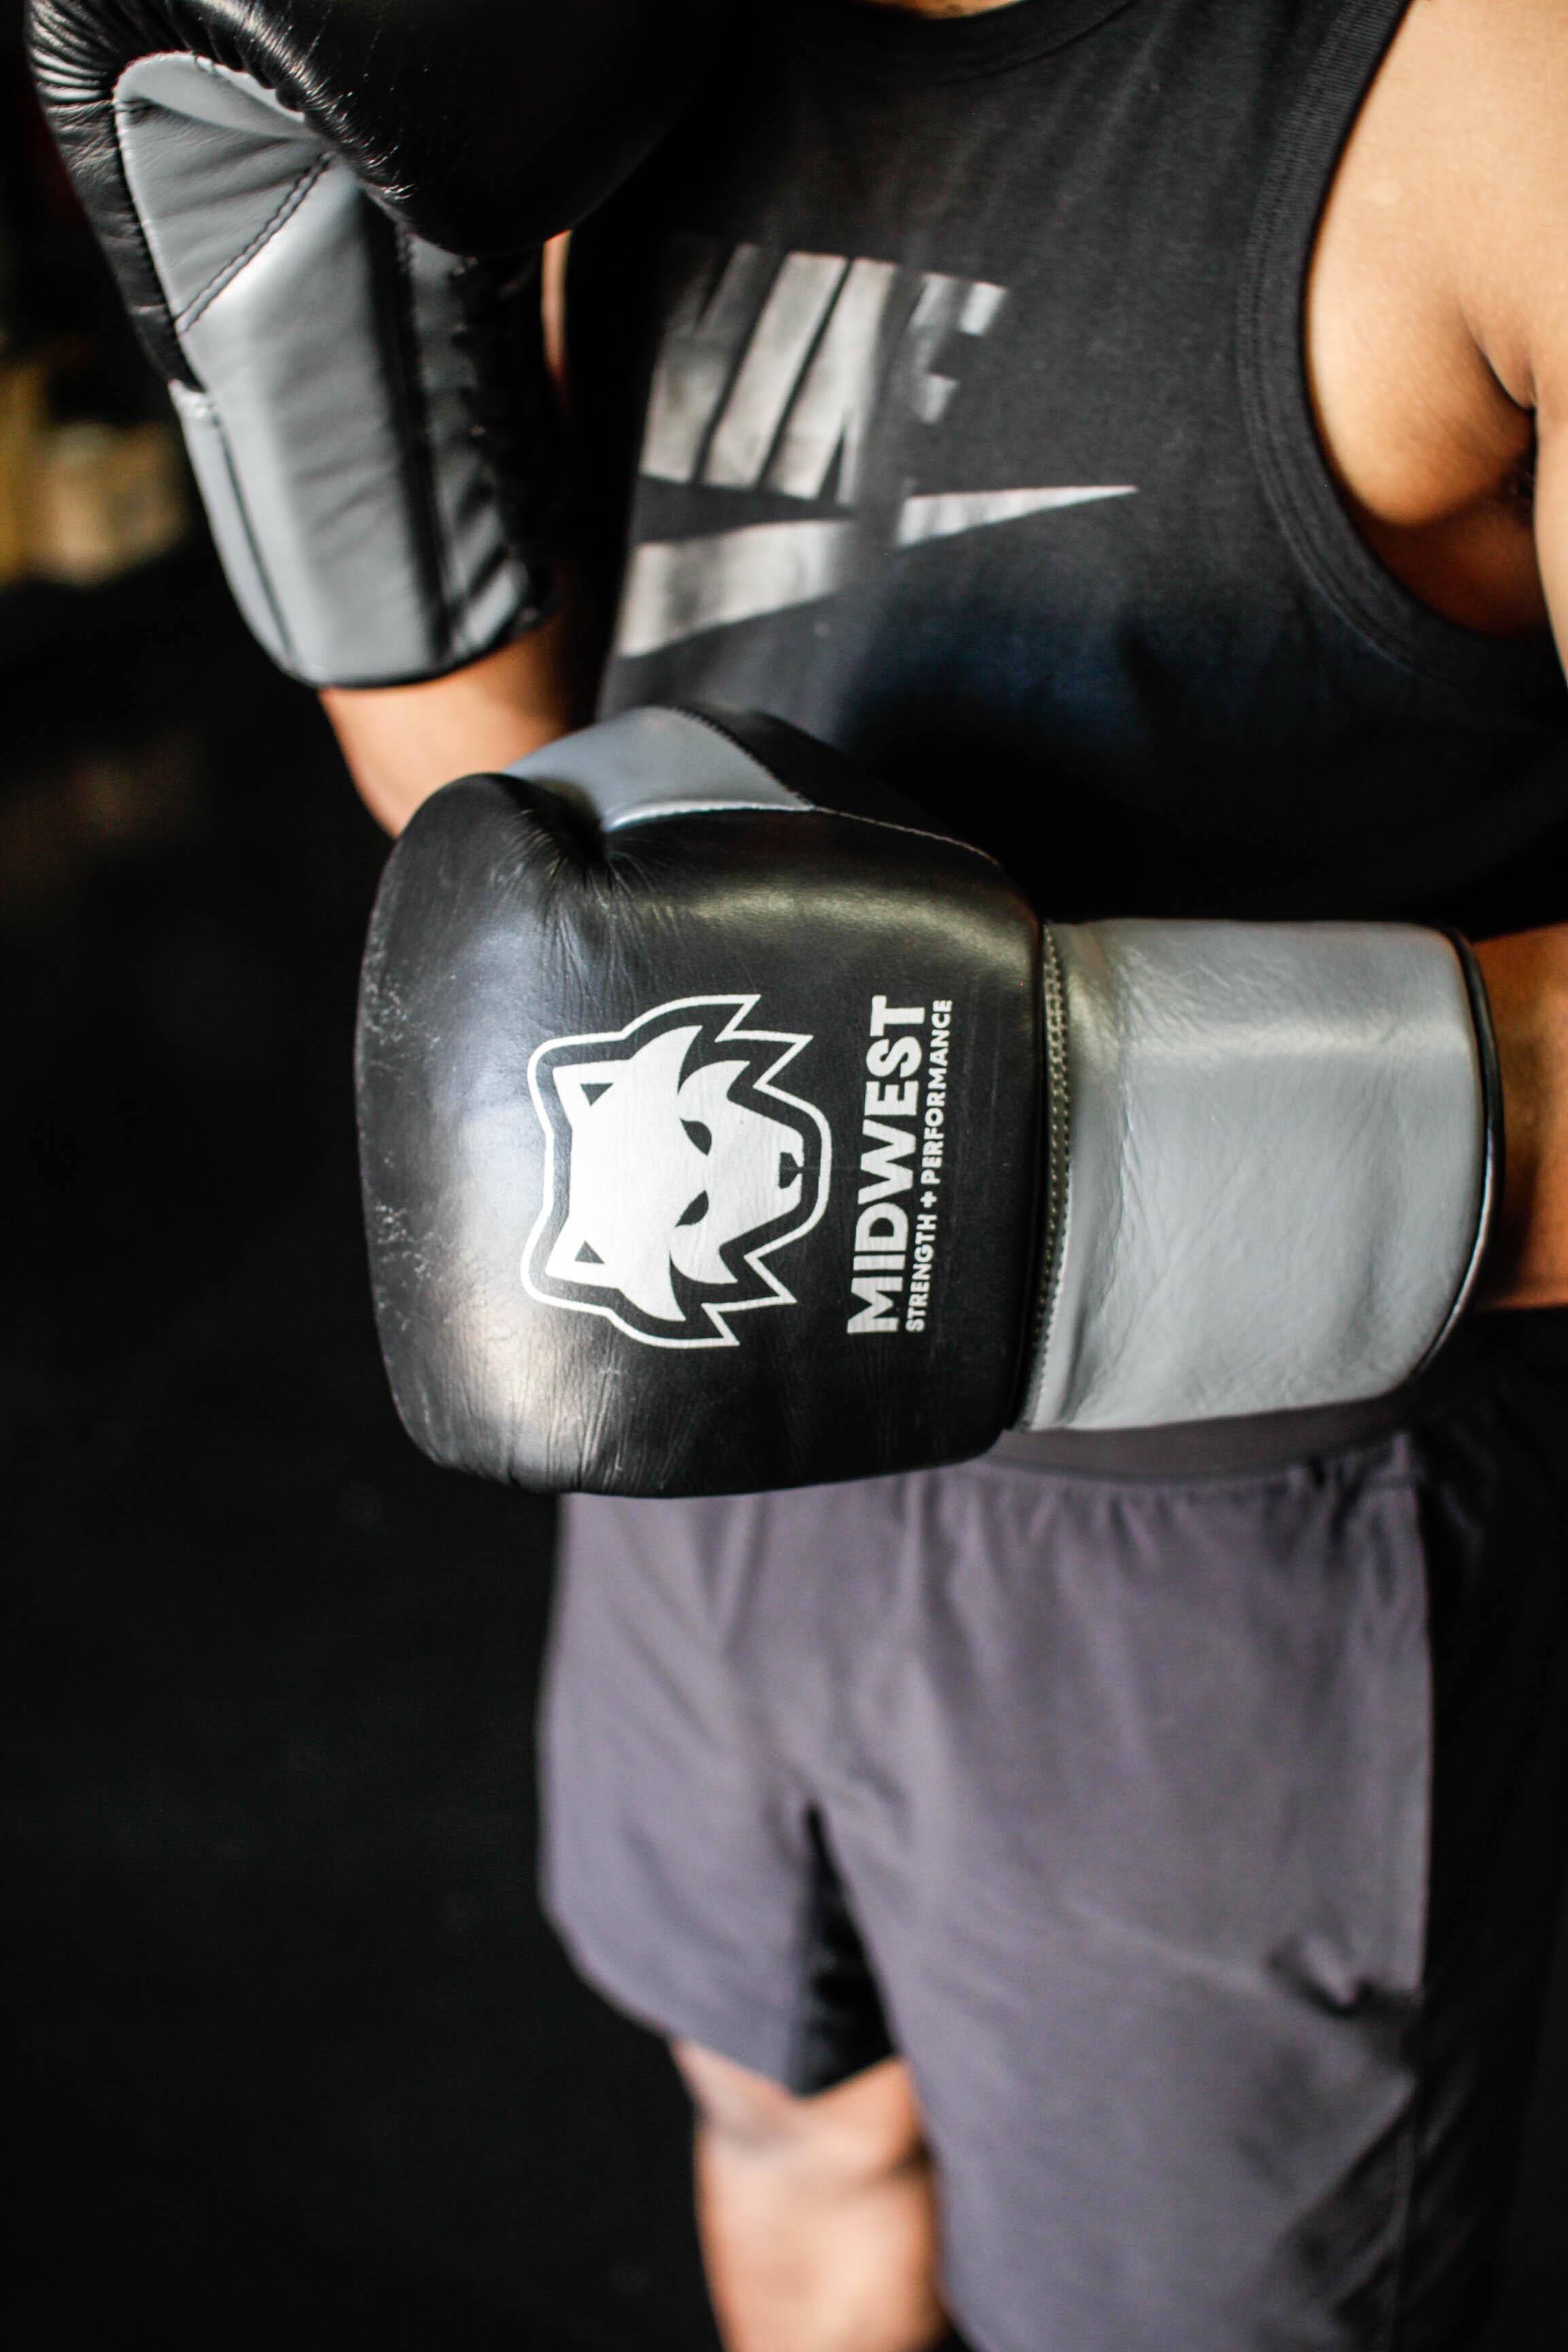 Boxing classes near Wheaton, Illinois